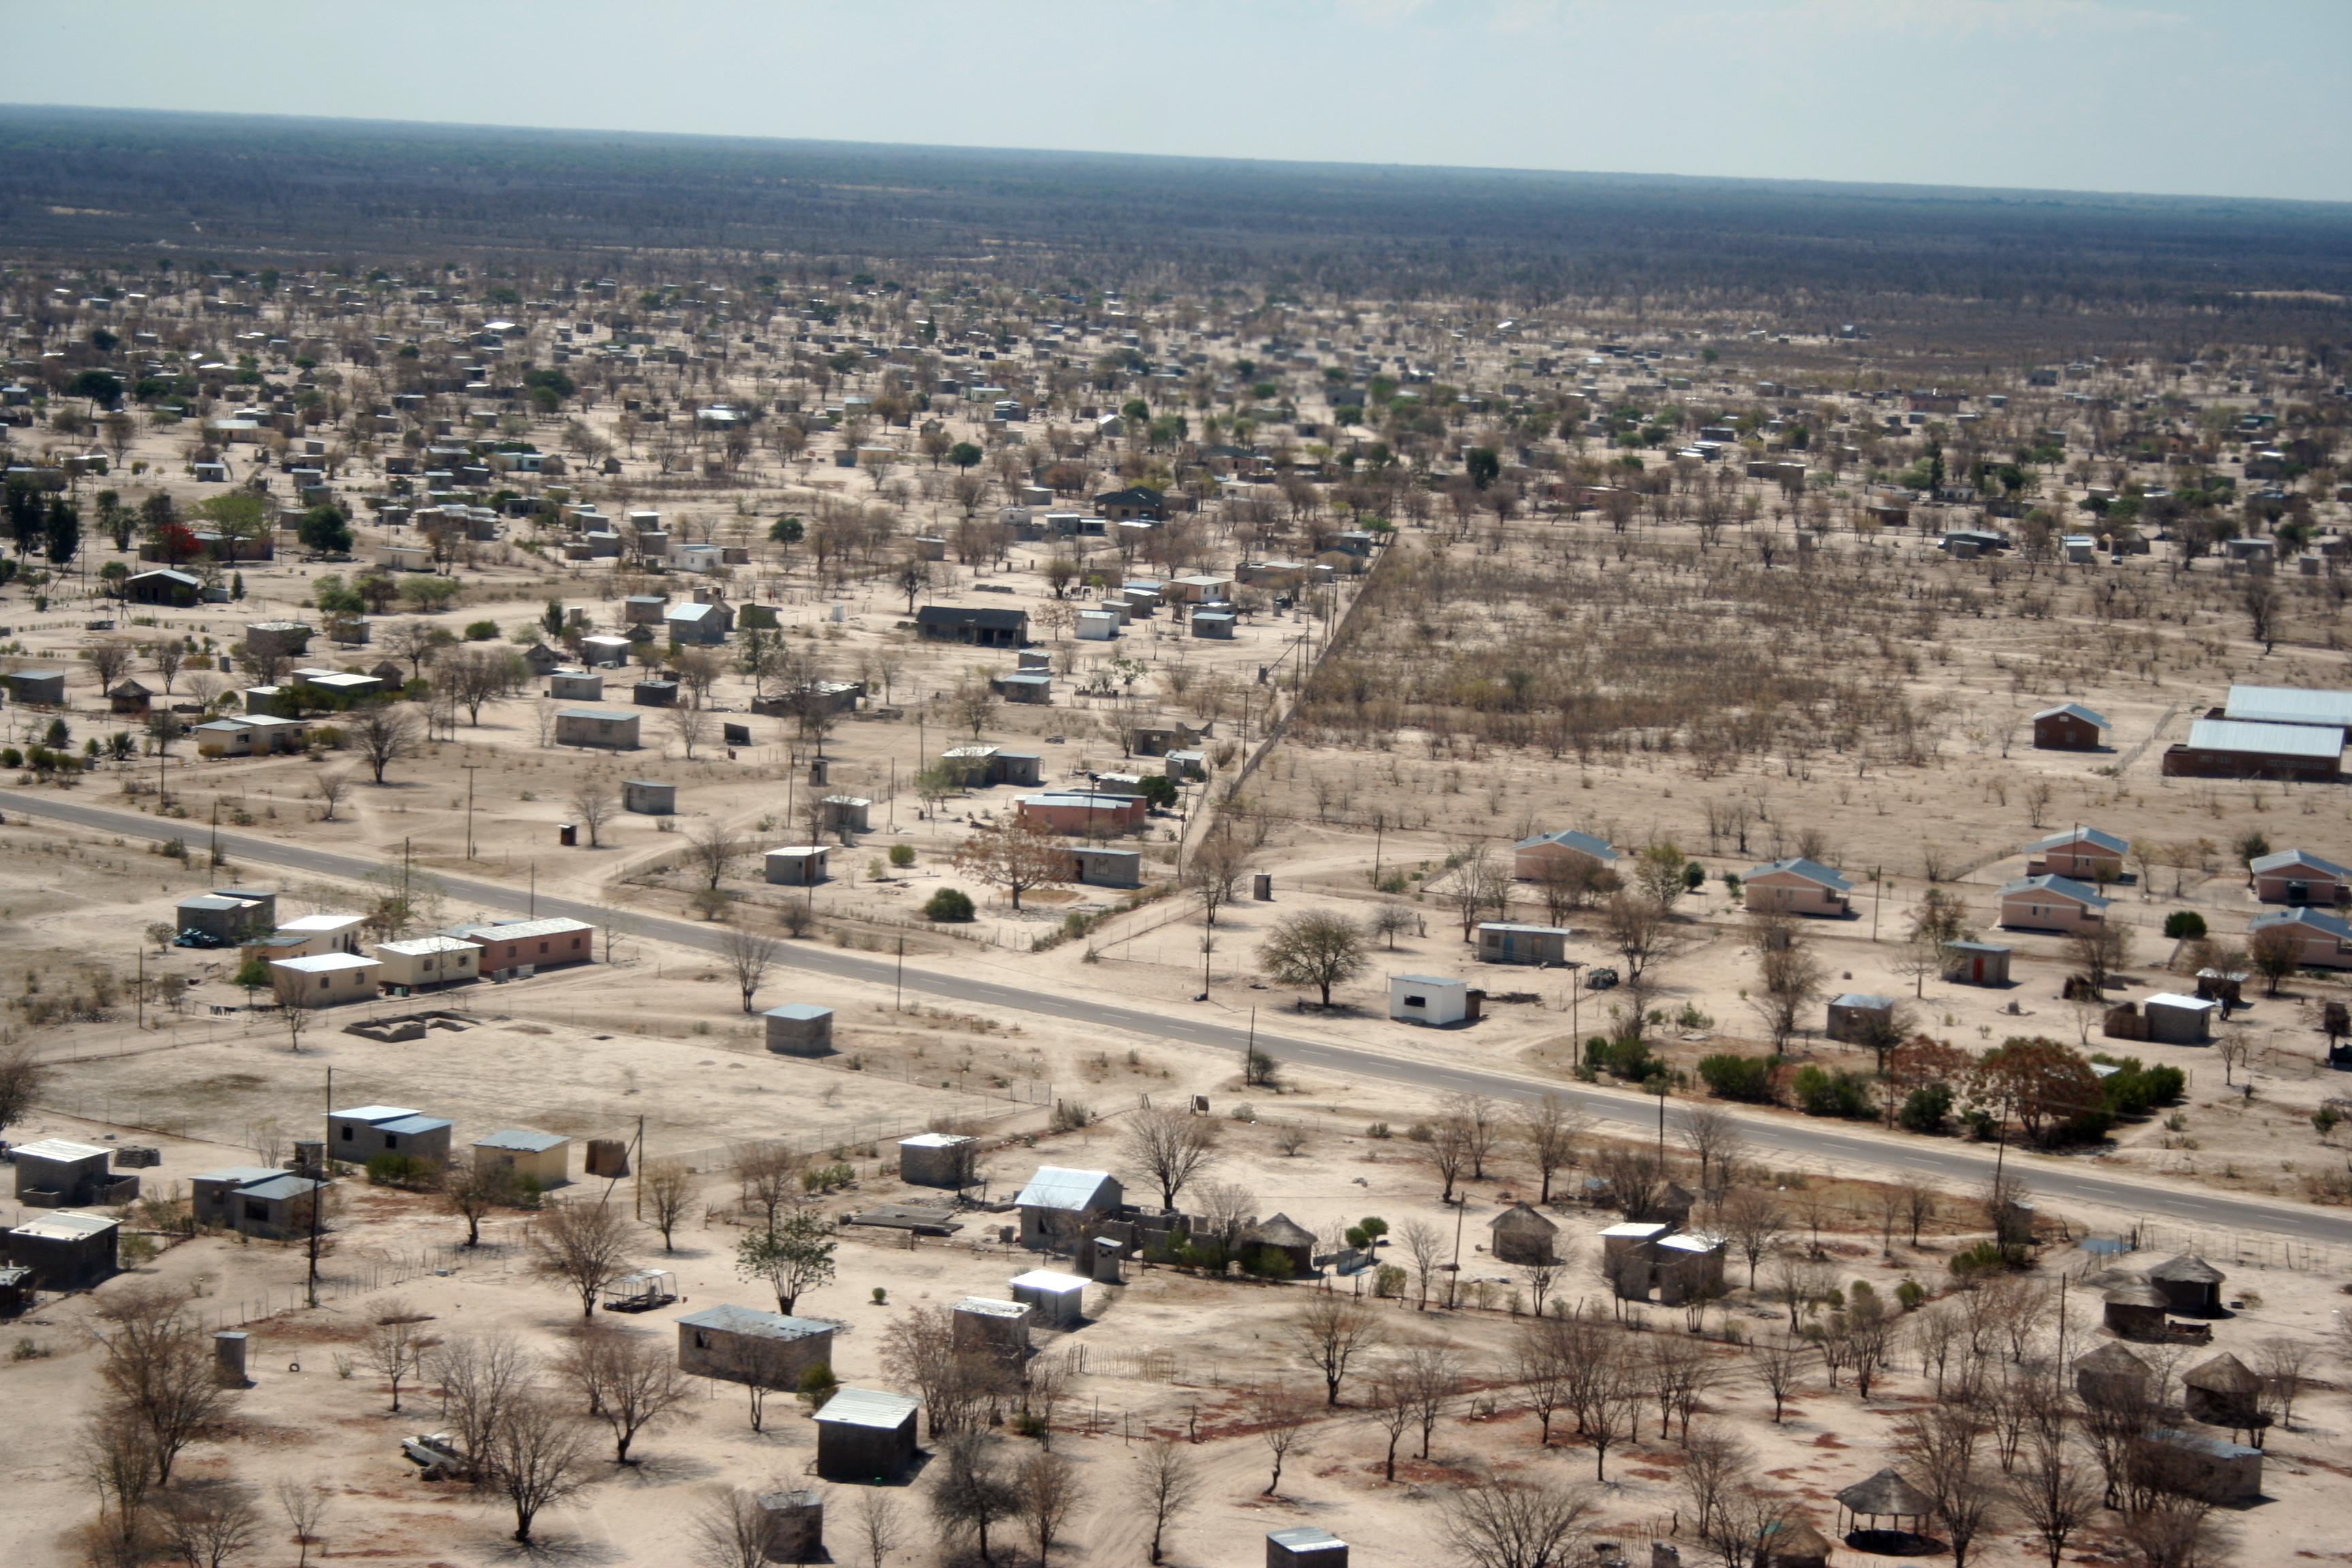 Mahalapye Botswana  city photos gallery : Maun Botswana Gallery SkyscraperCity